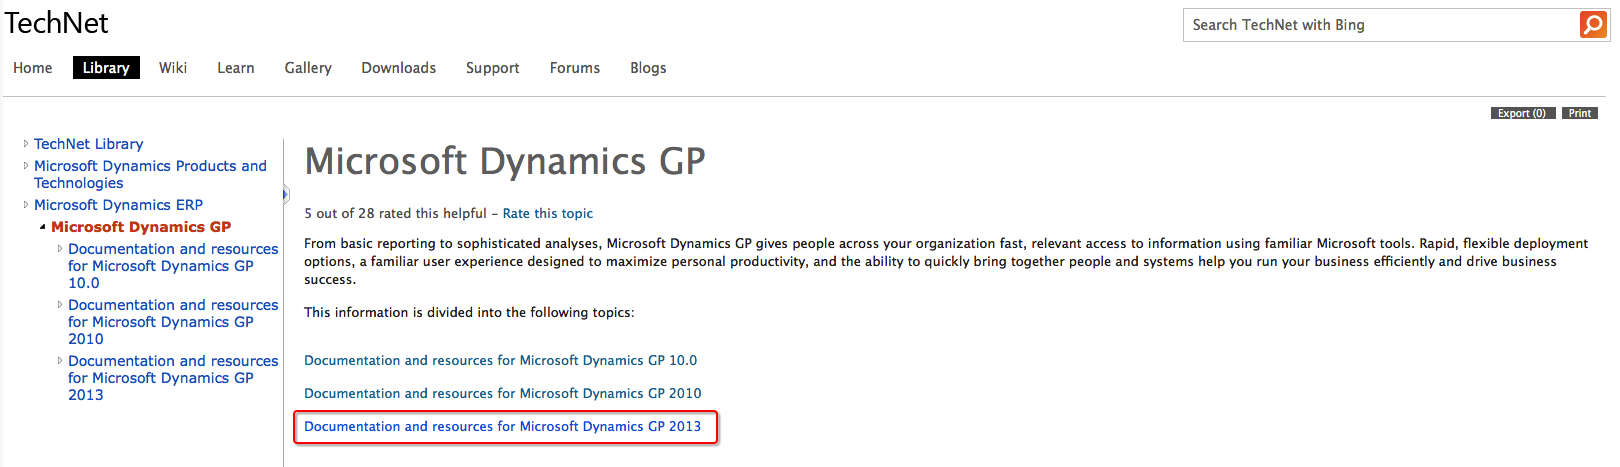 microsoft dynamics gp 2013 manuals